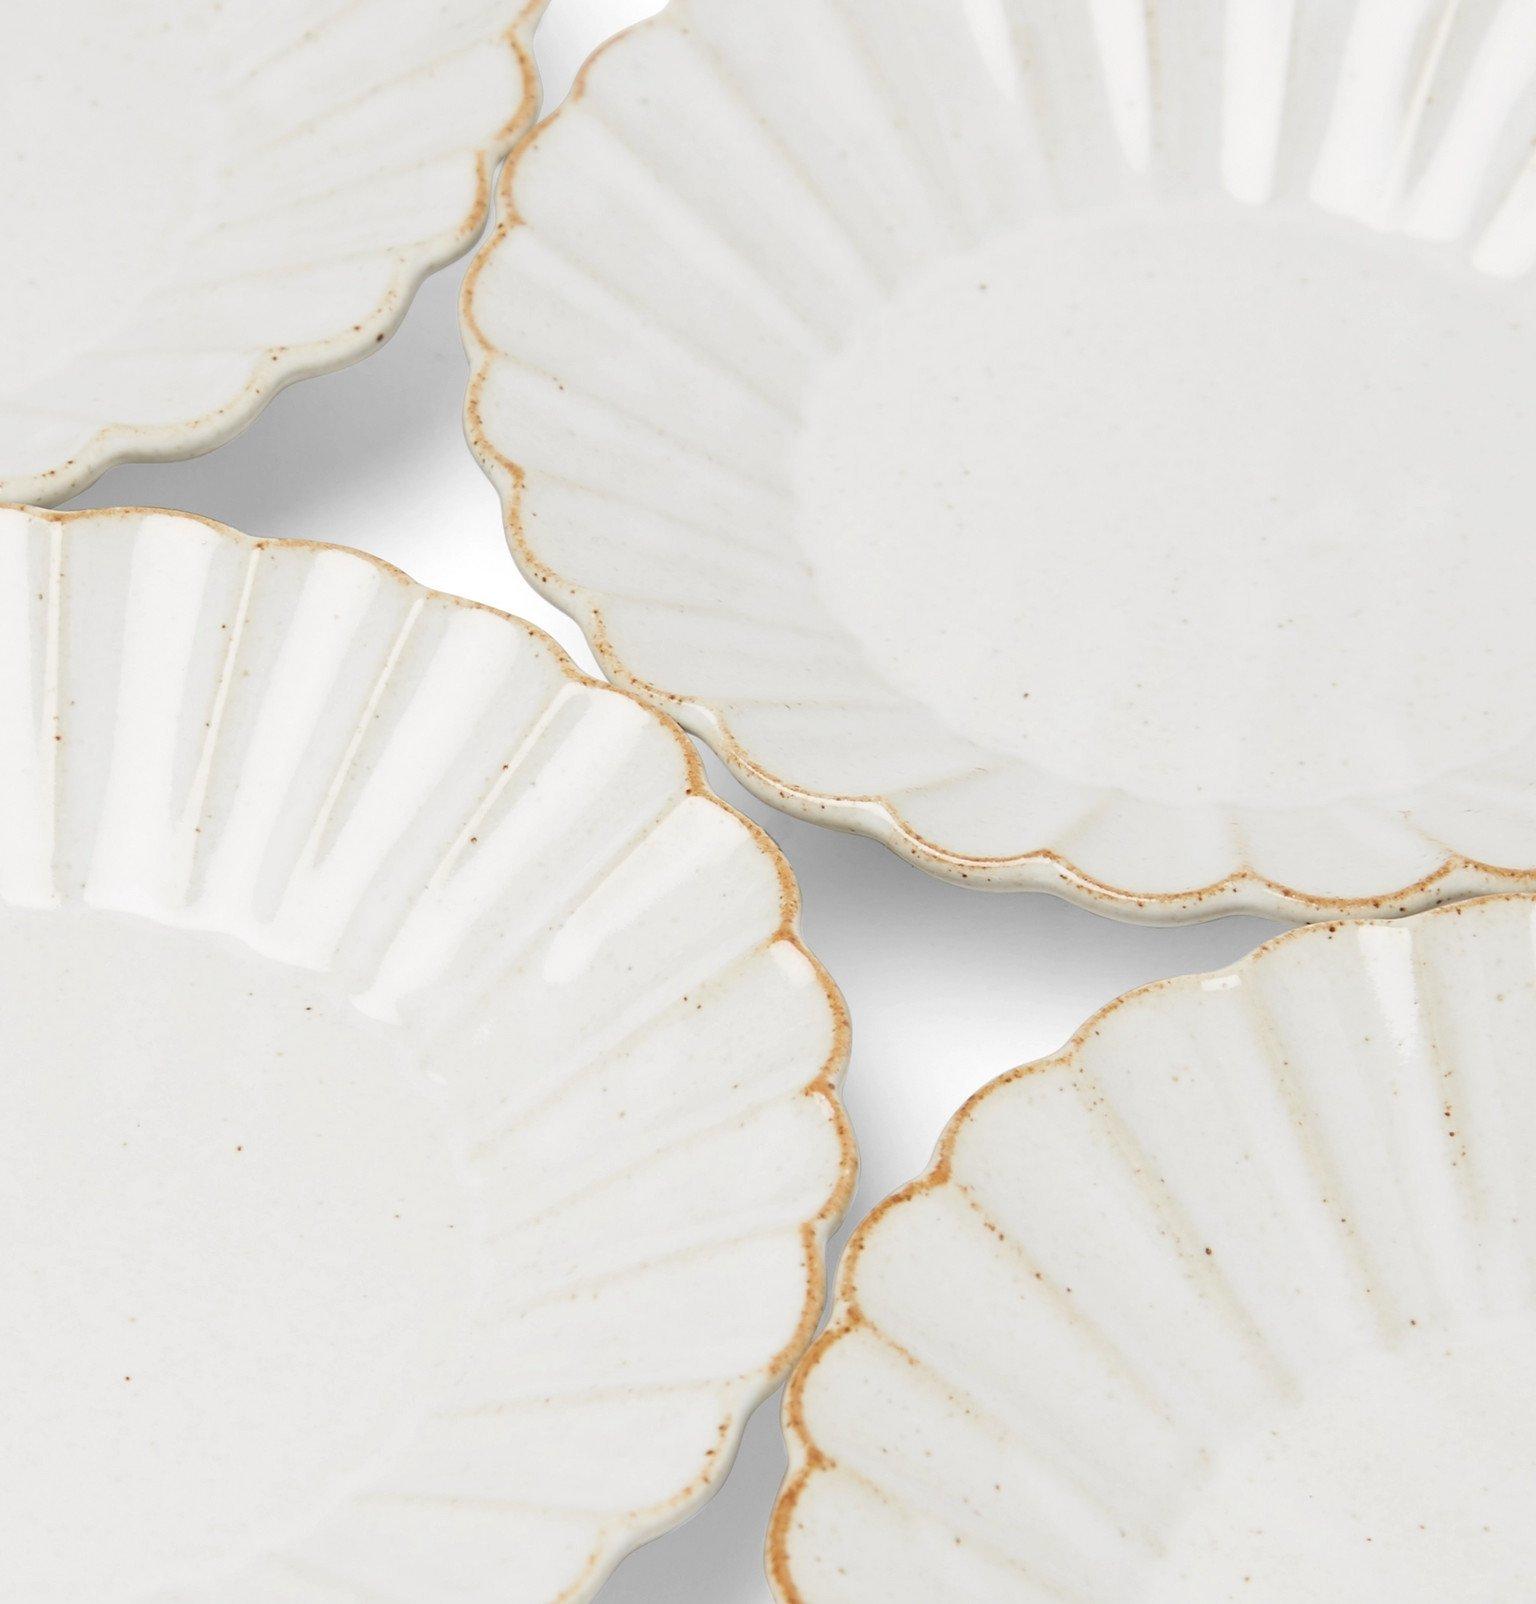 Roman & Williams Guild - Marumitsu M Studio Set of Four Barbarie Earthenware Plates - Neutrals